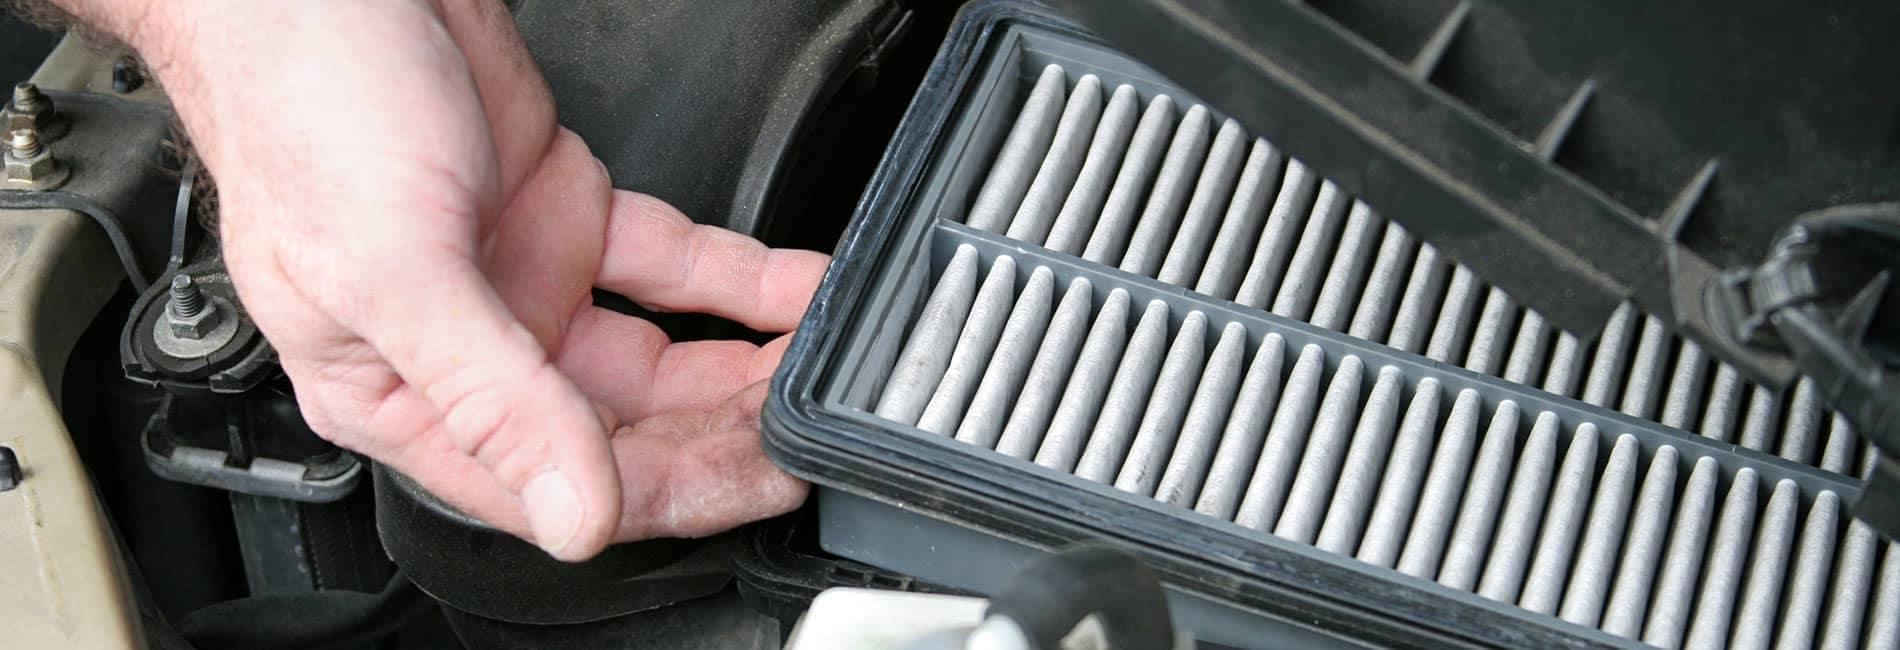 man lifting out car air filter